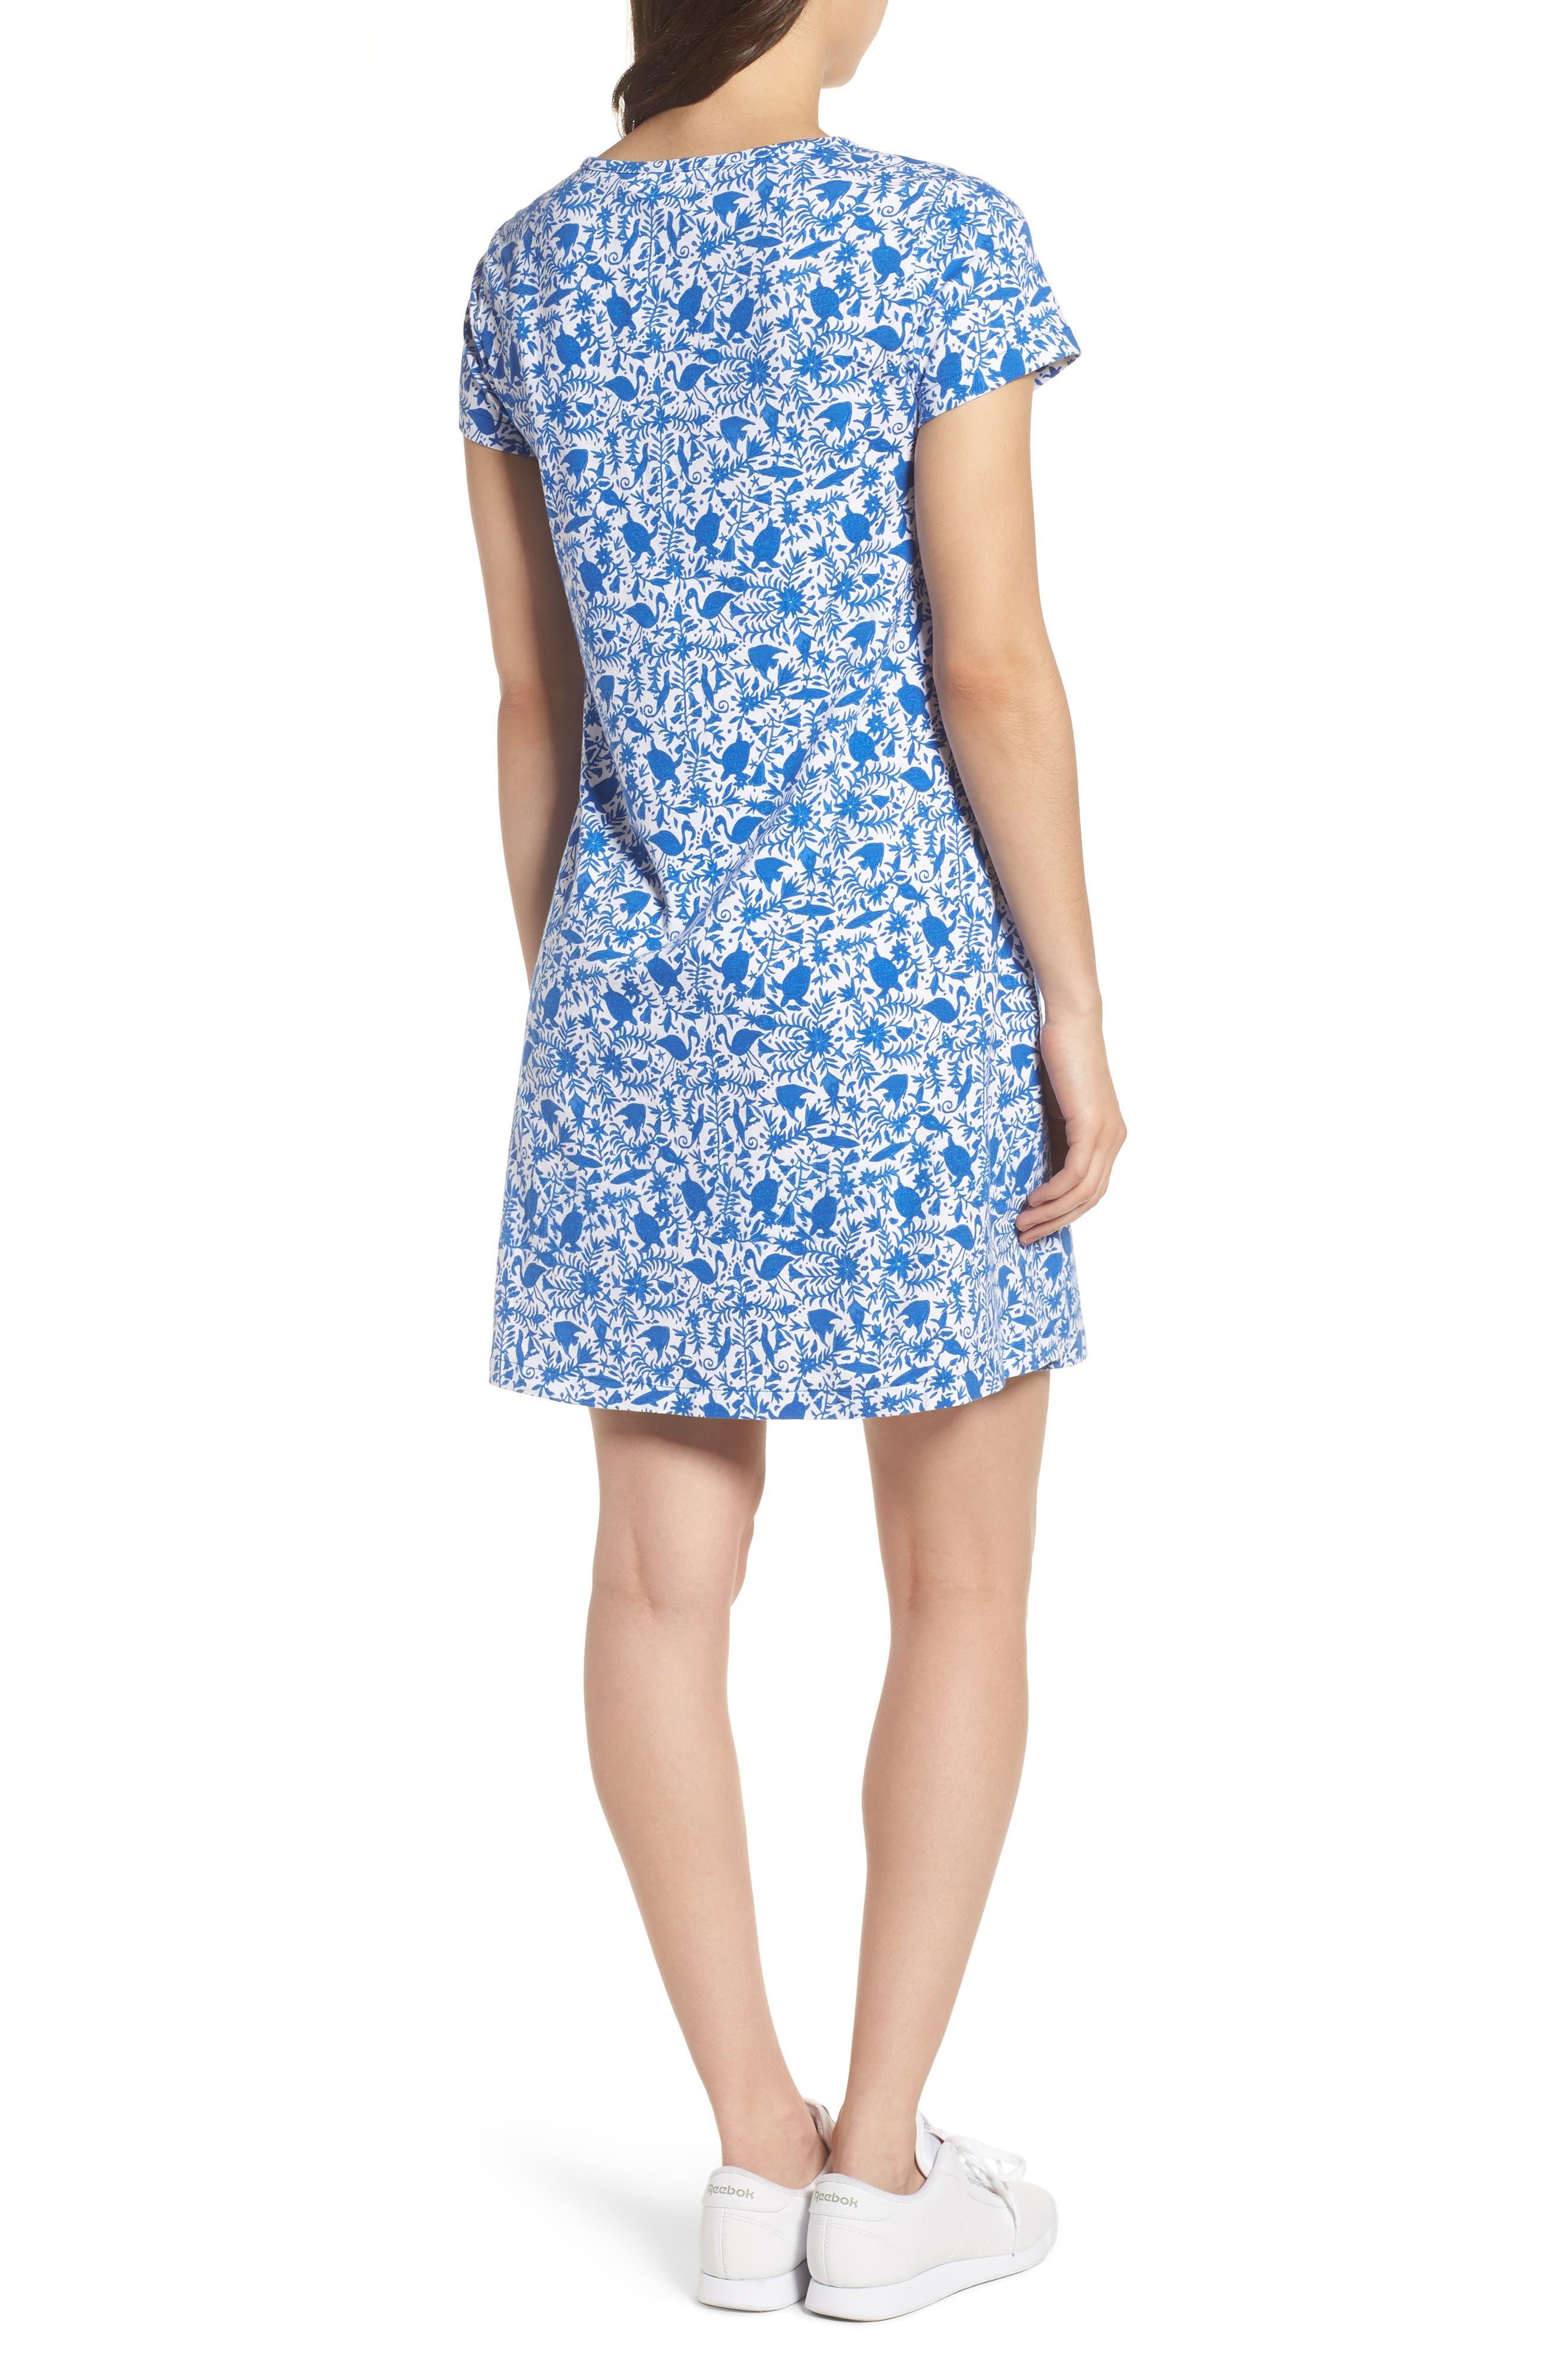 Bahamas Otomi Print Stretch Cotton Dress,                             Alternate thumbnail 2, color,                             413